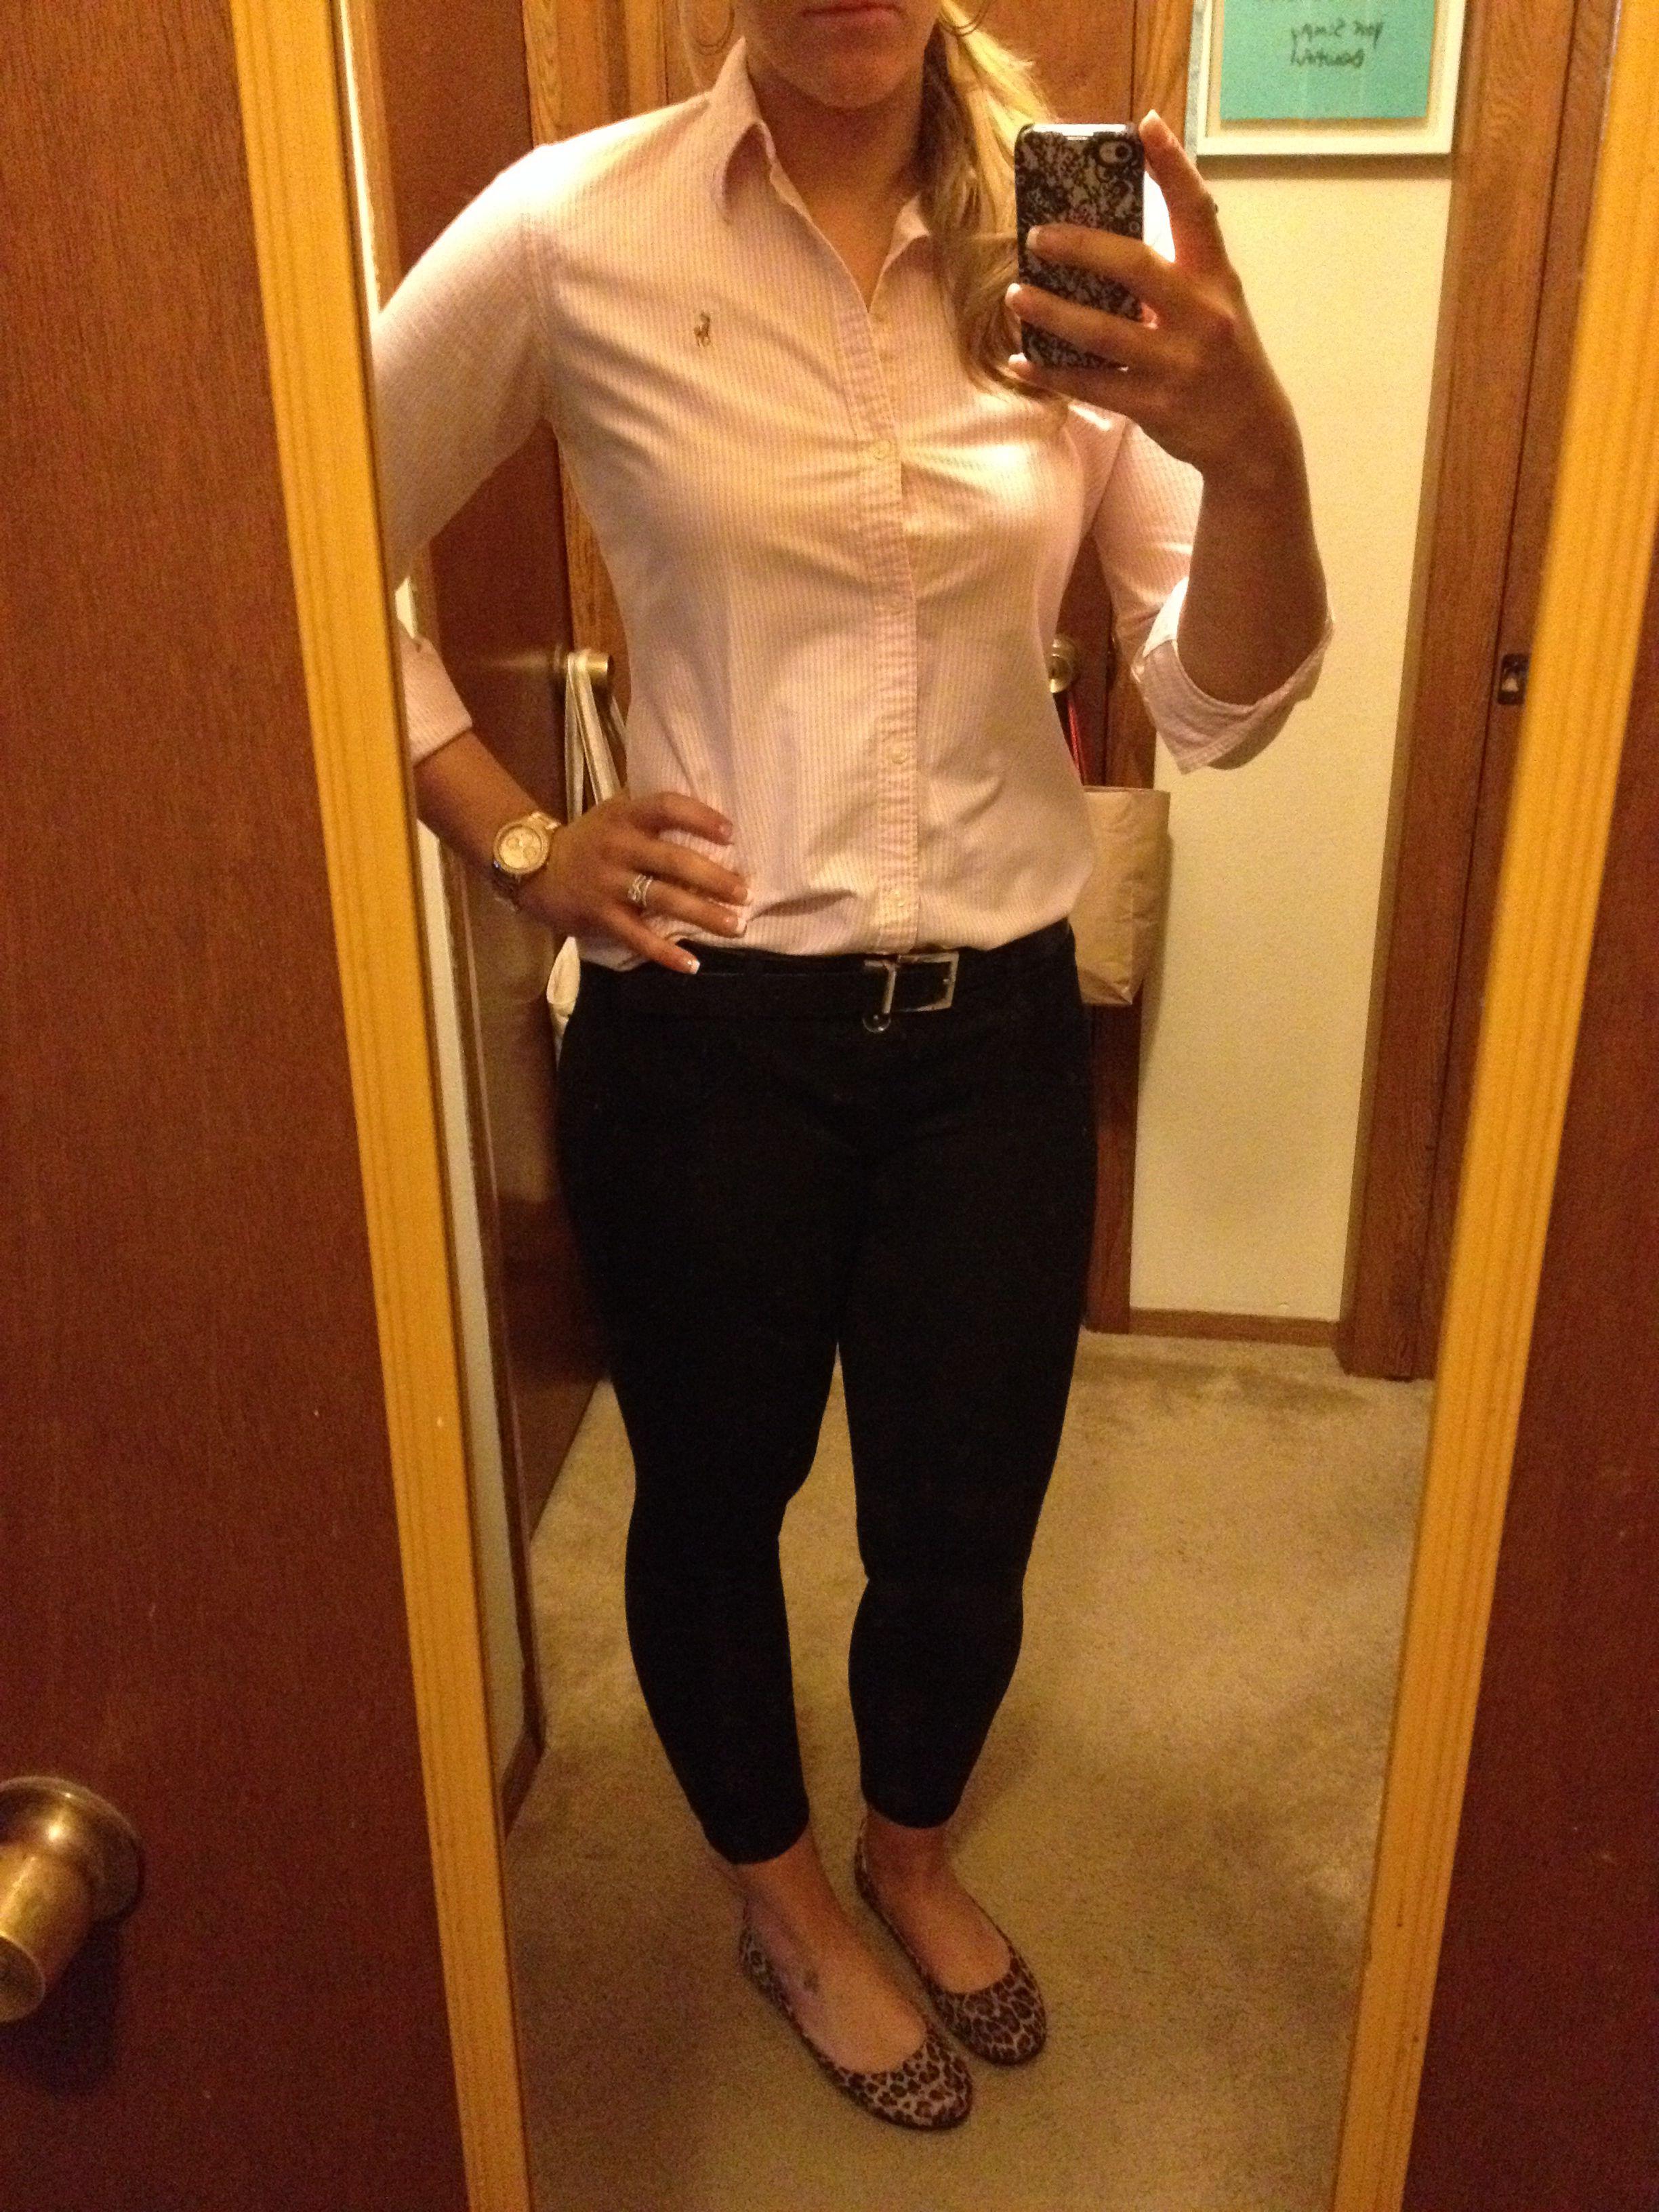 a9c05fe4b5f Business Casual Work Outfit  31 Pants and Belt- Kohls Shoes- Target Shirt-  Ralph Lauren